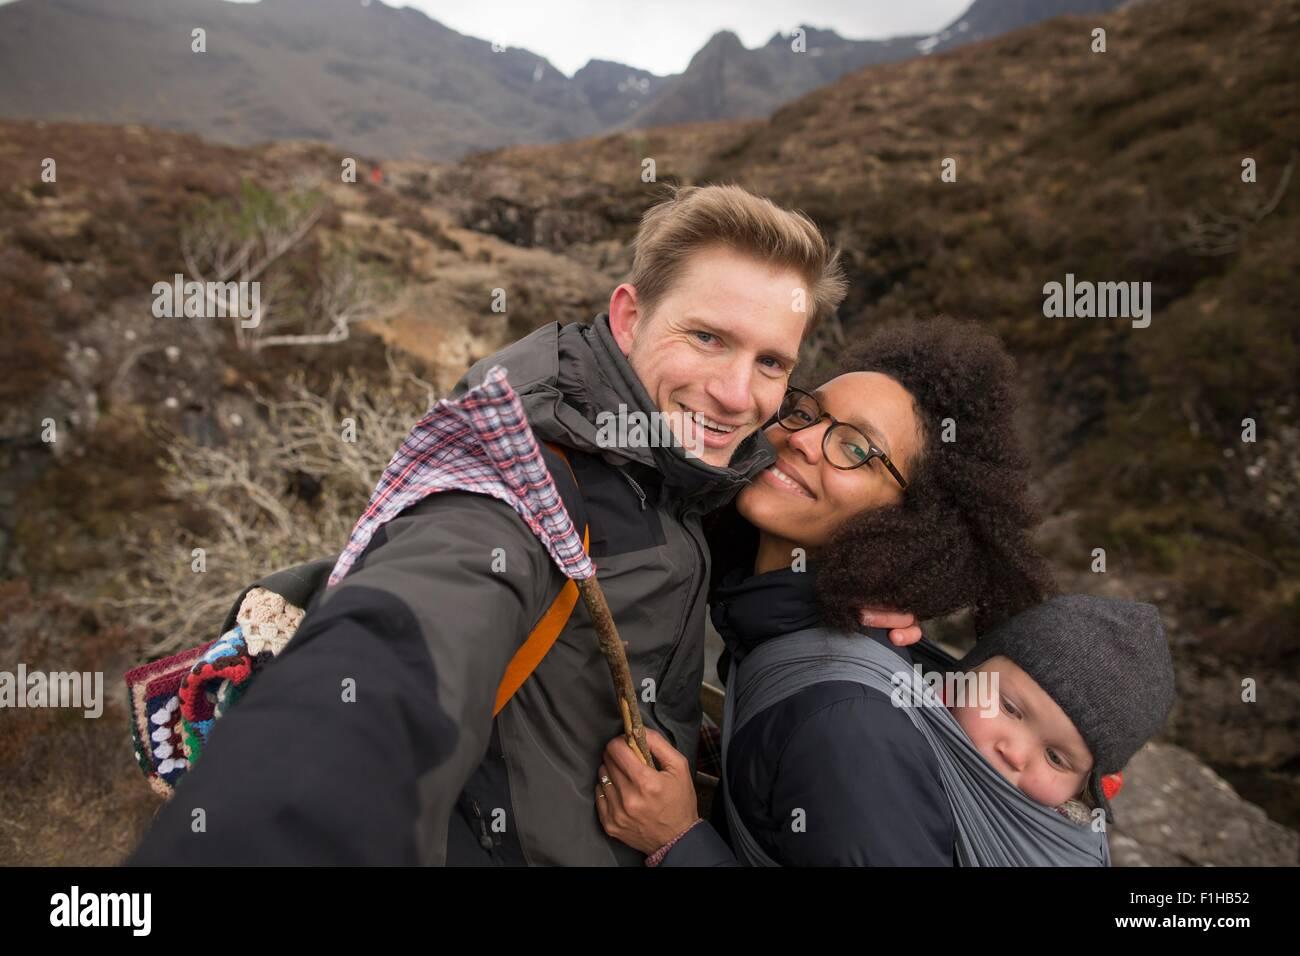 Family on hike, smiling towards camera - Stock Image